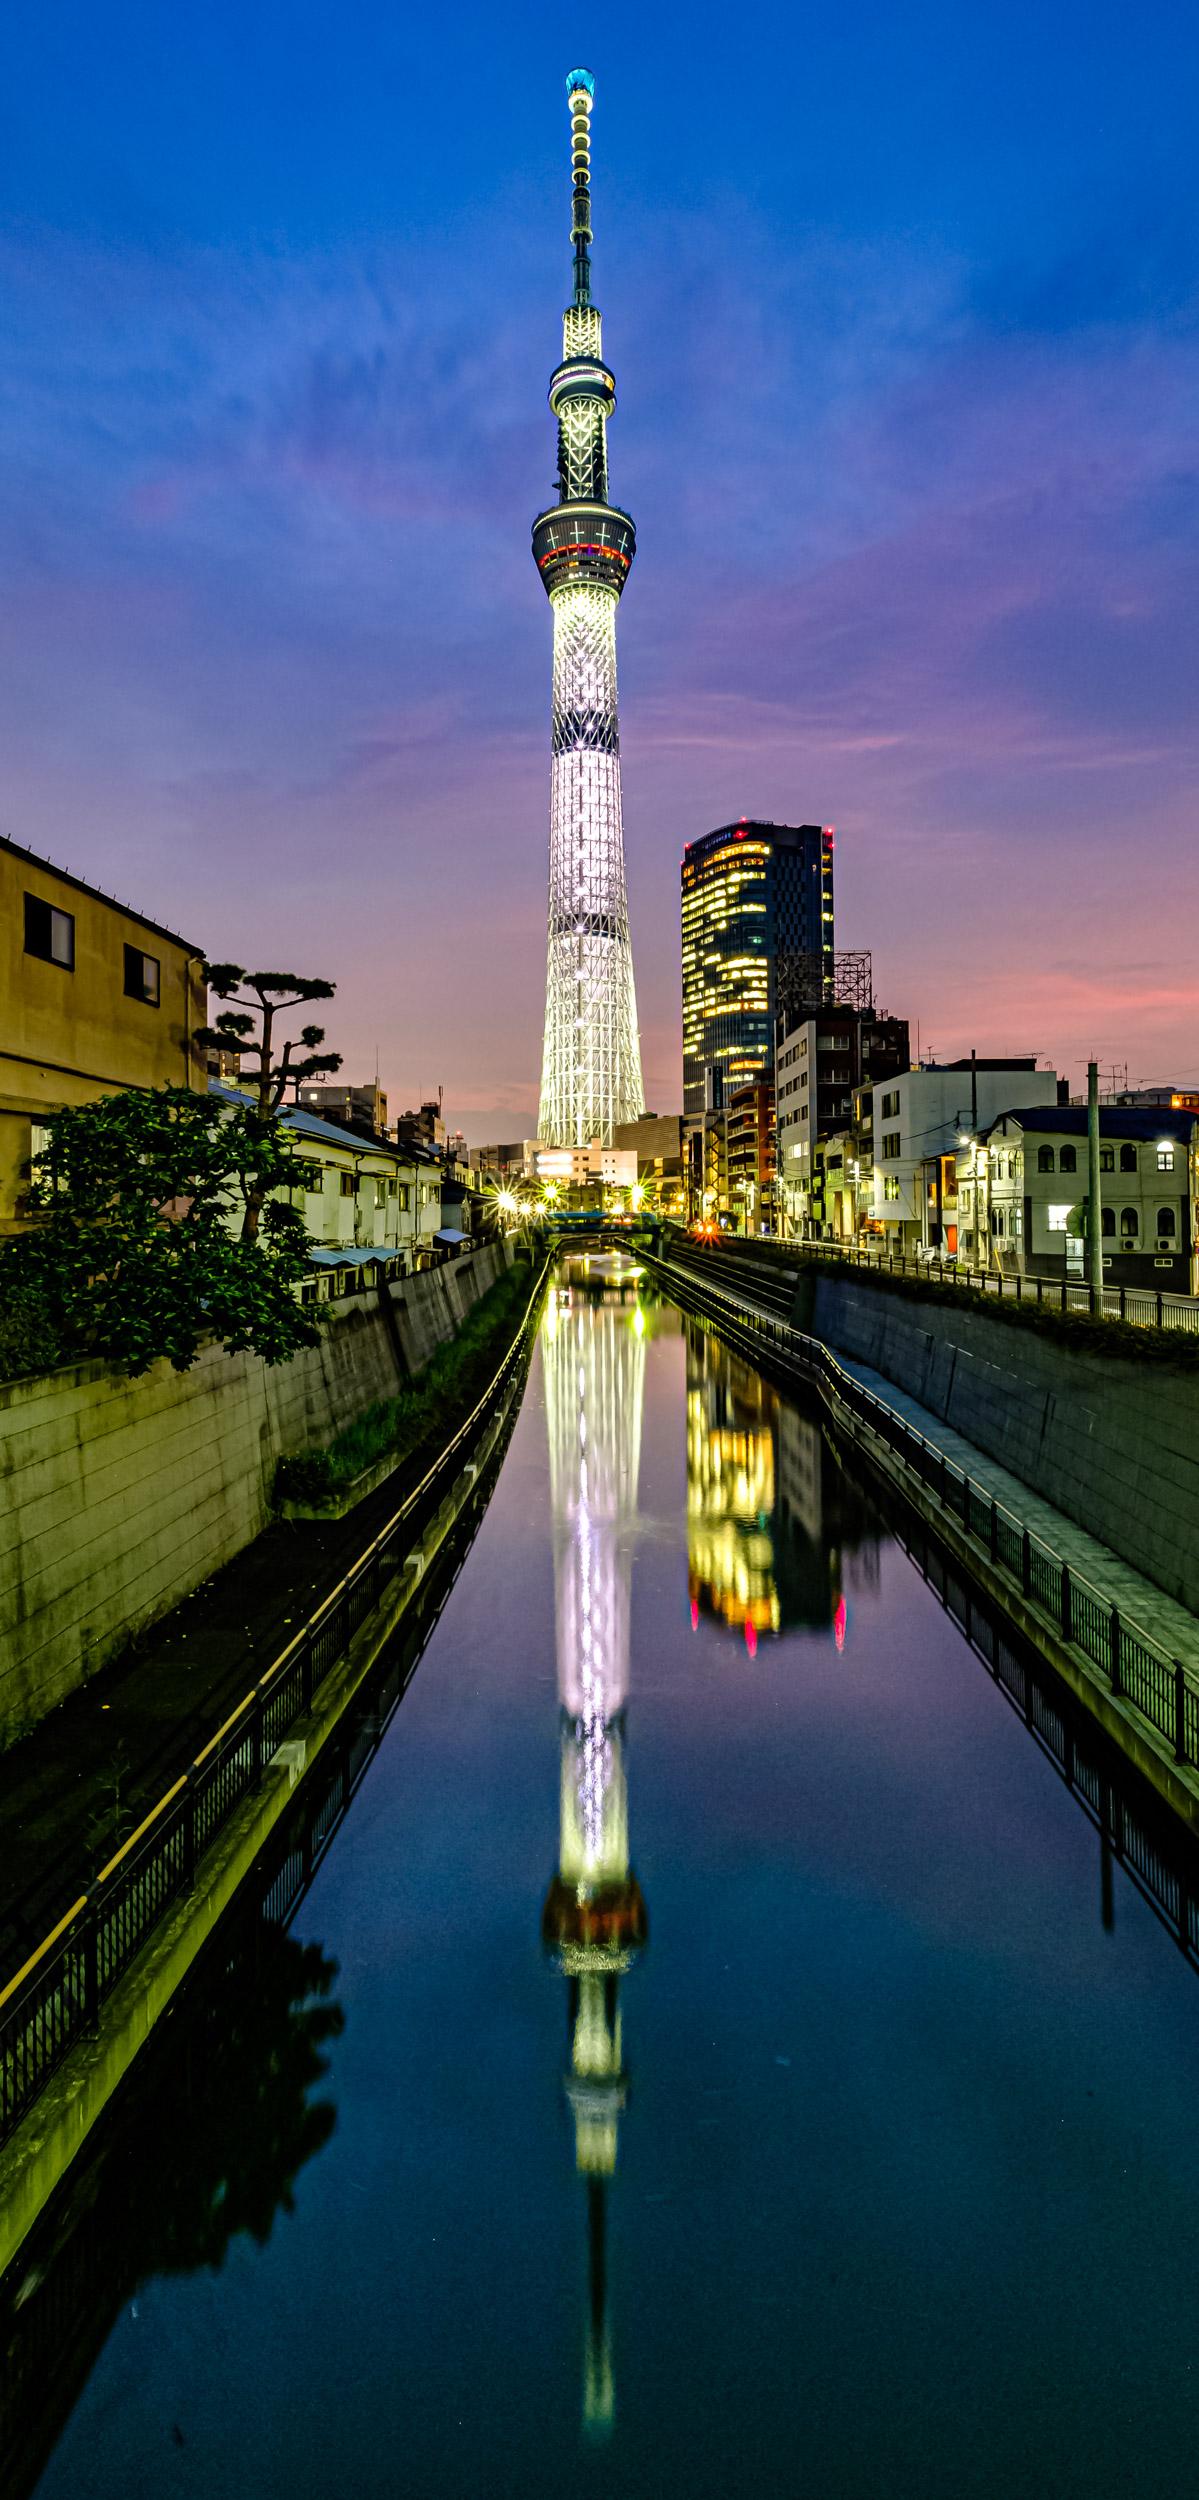 The full reflection of Tokyo Skytree in Kitajukken river